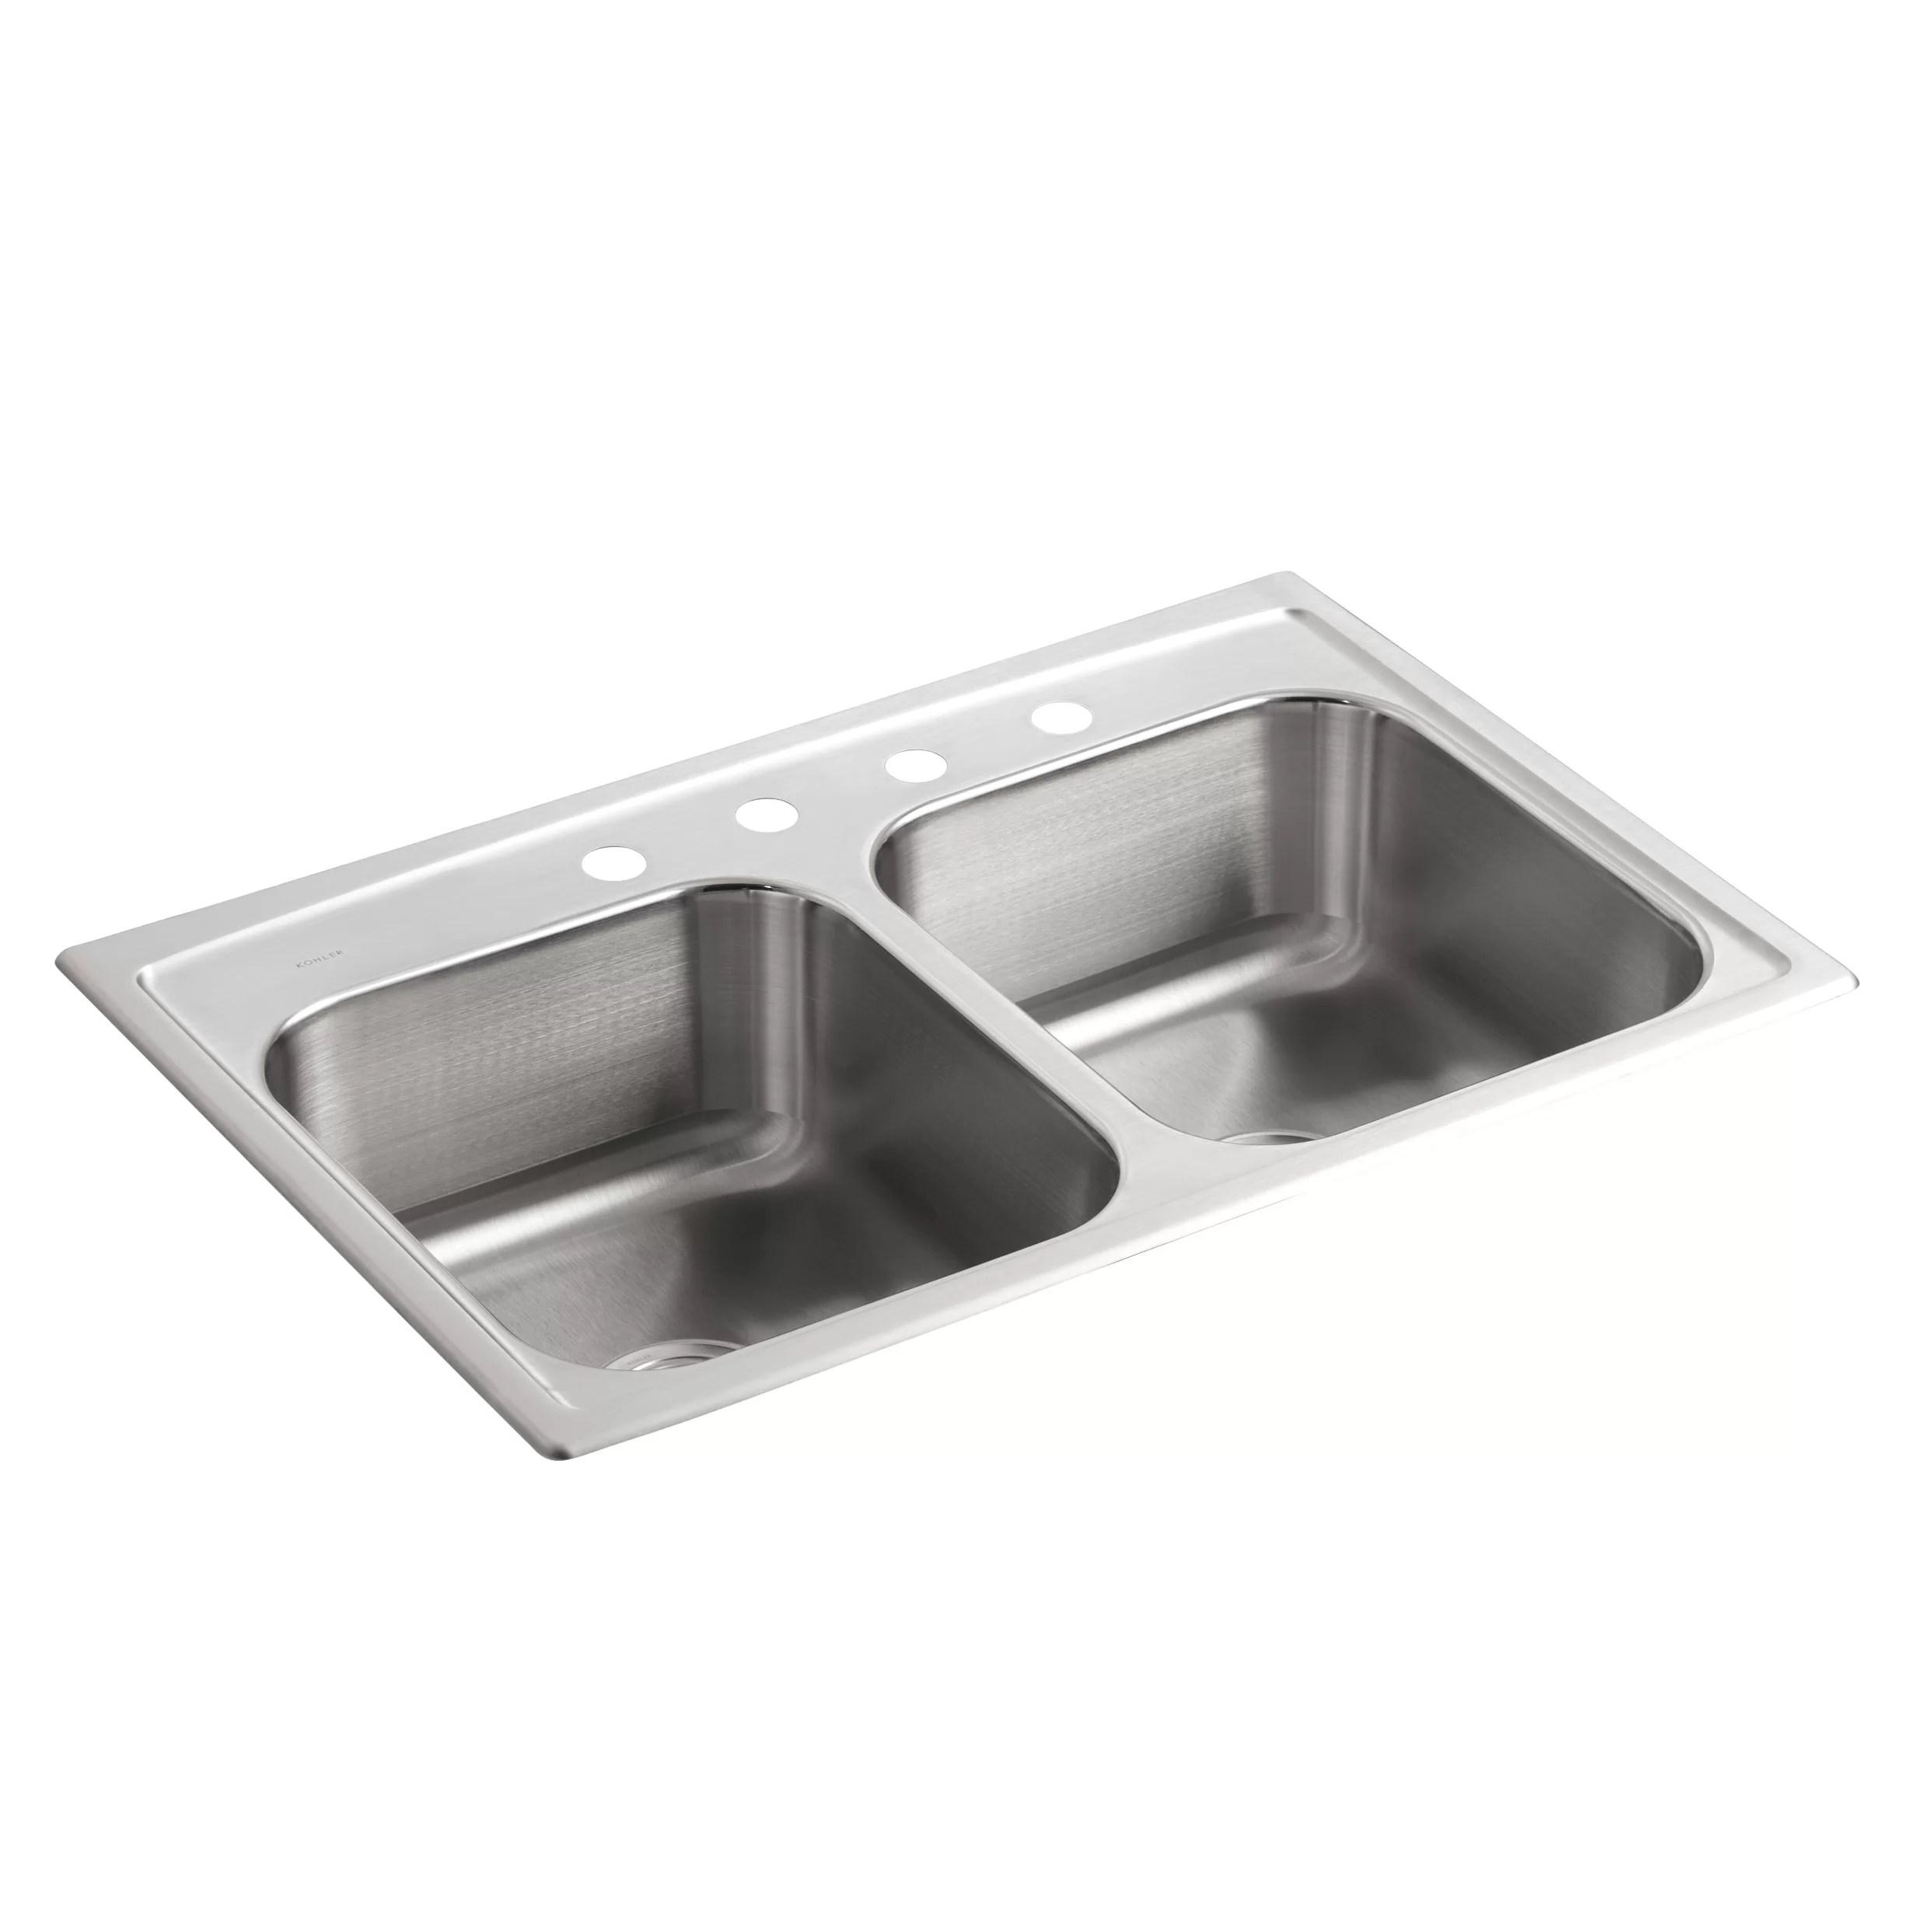 kohler toccata 33 l x 22 w drop in kitchen sink with 4 faucet holes wayfair